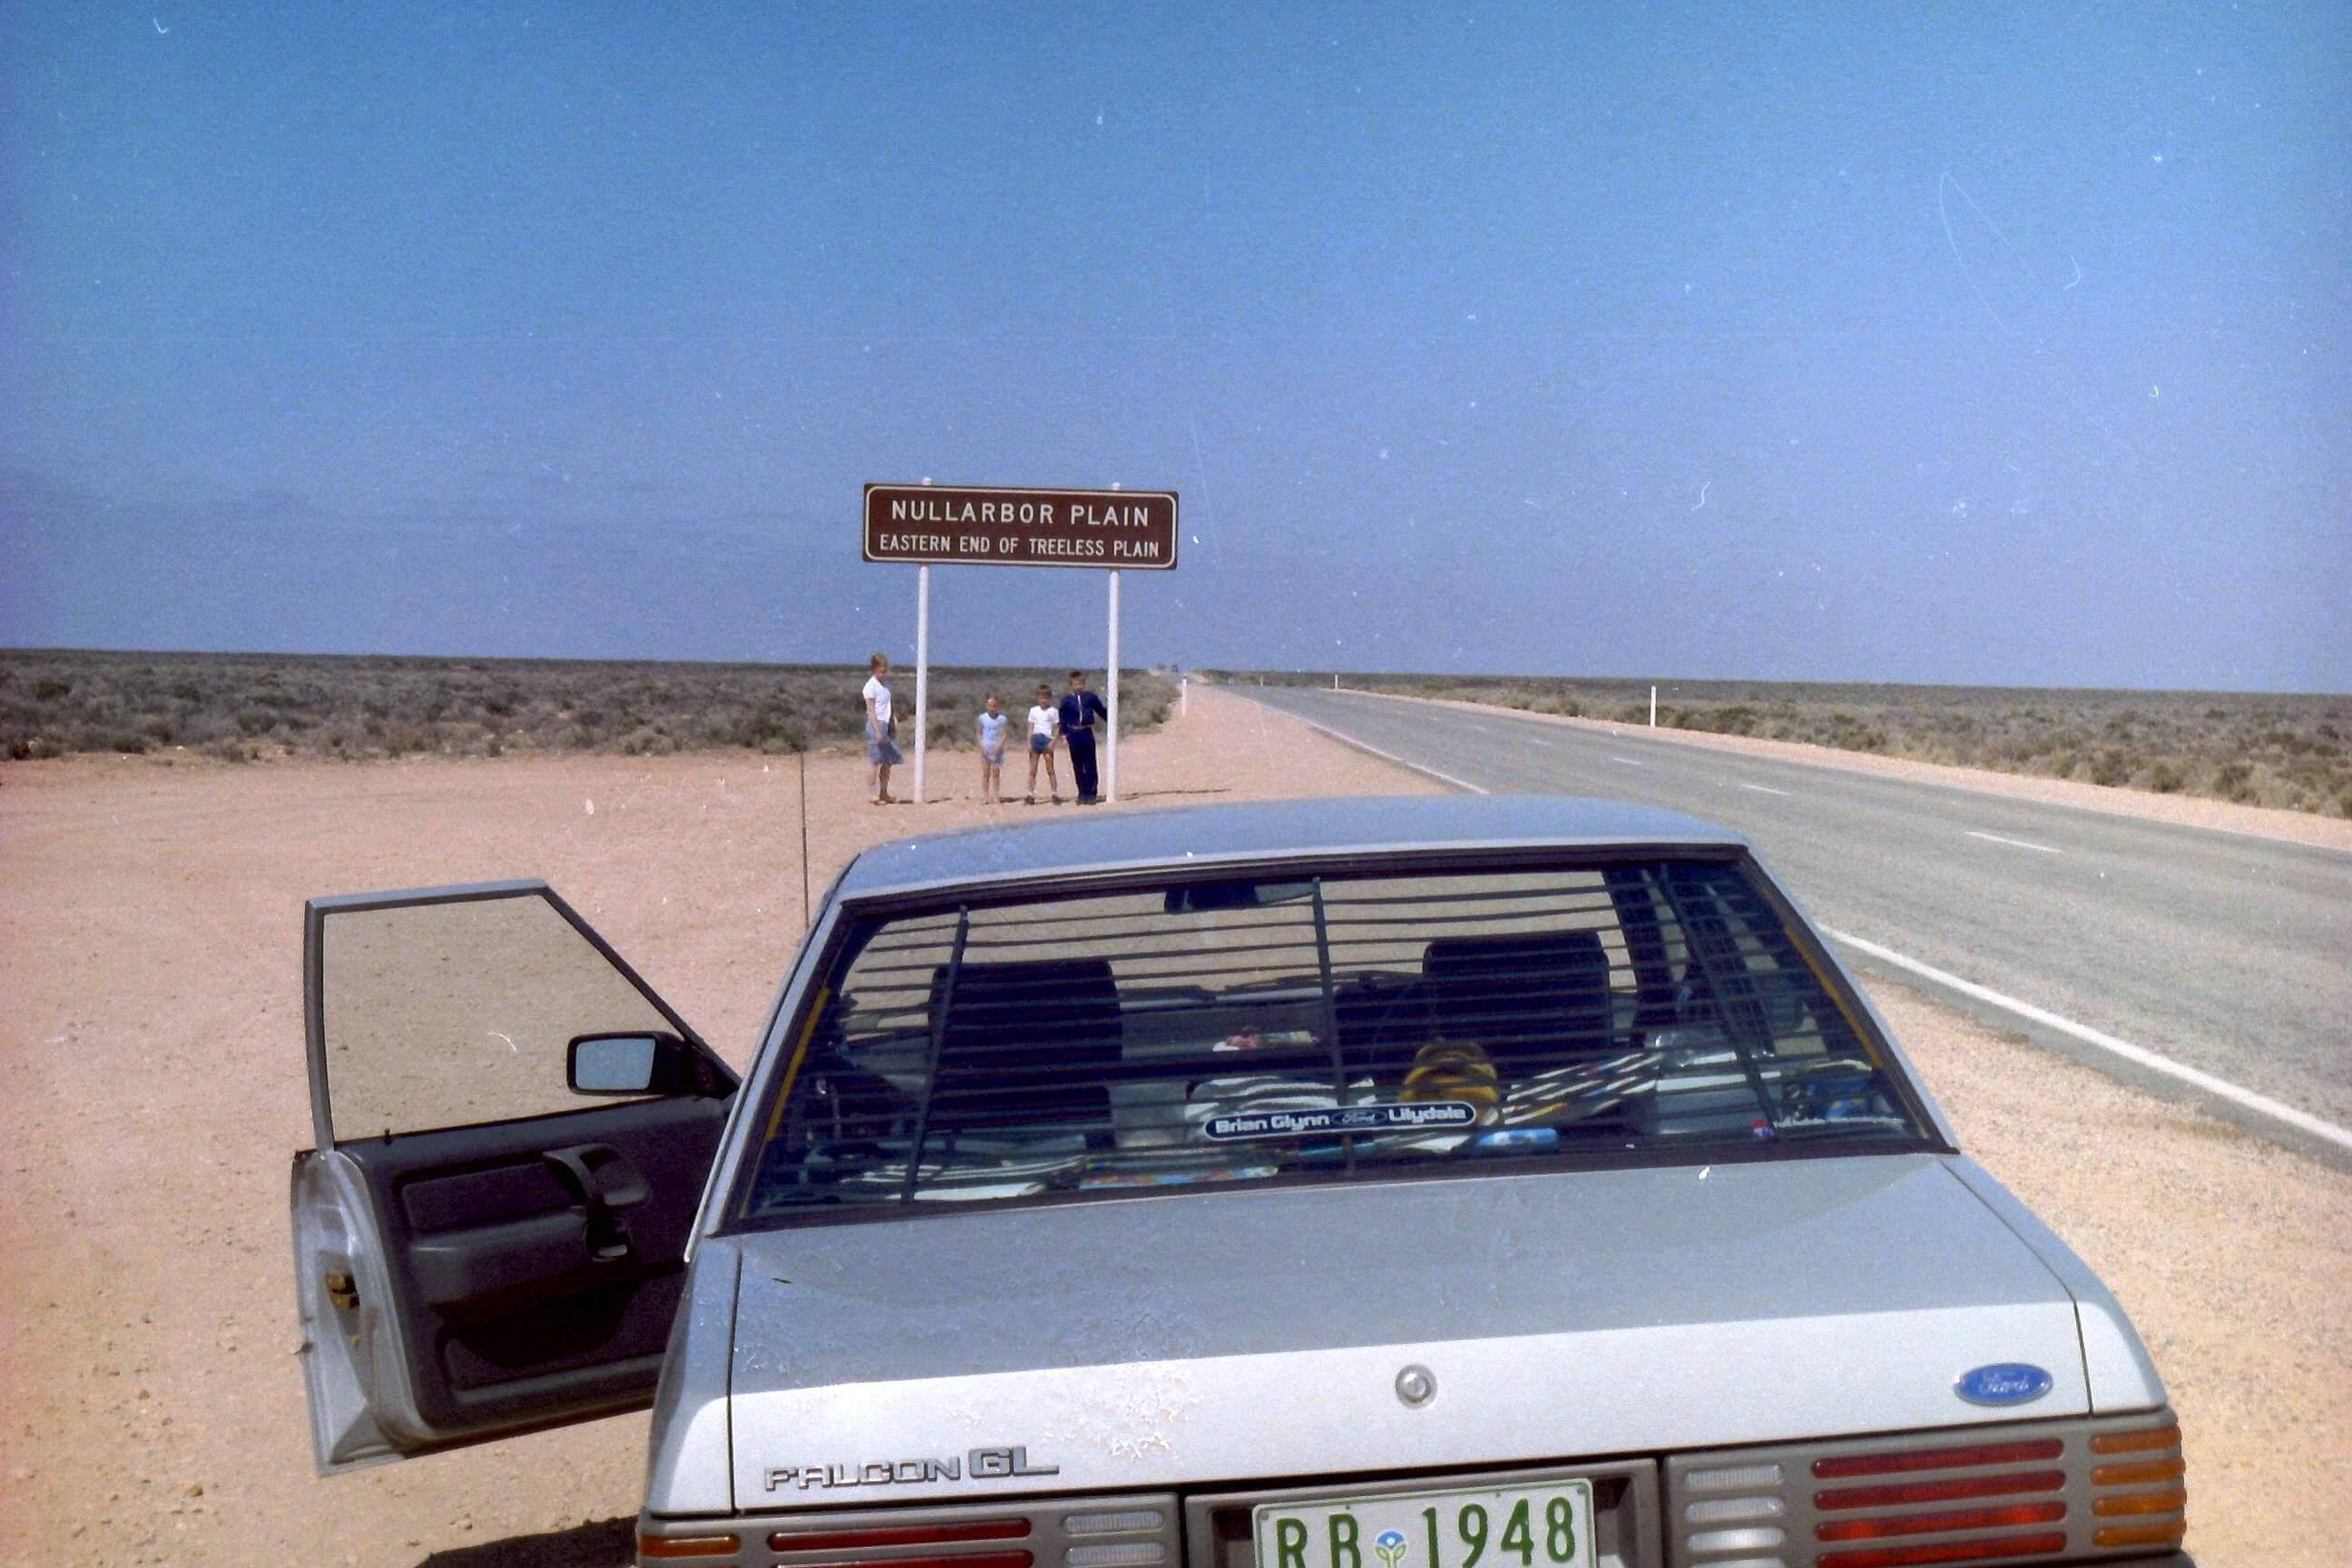 7 epic family road trip ideas